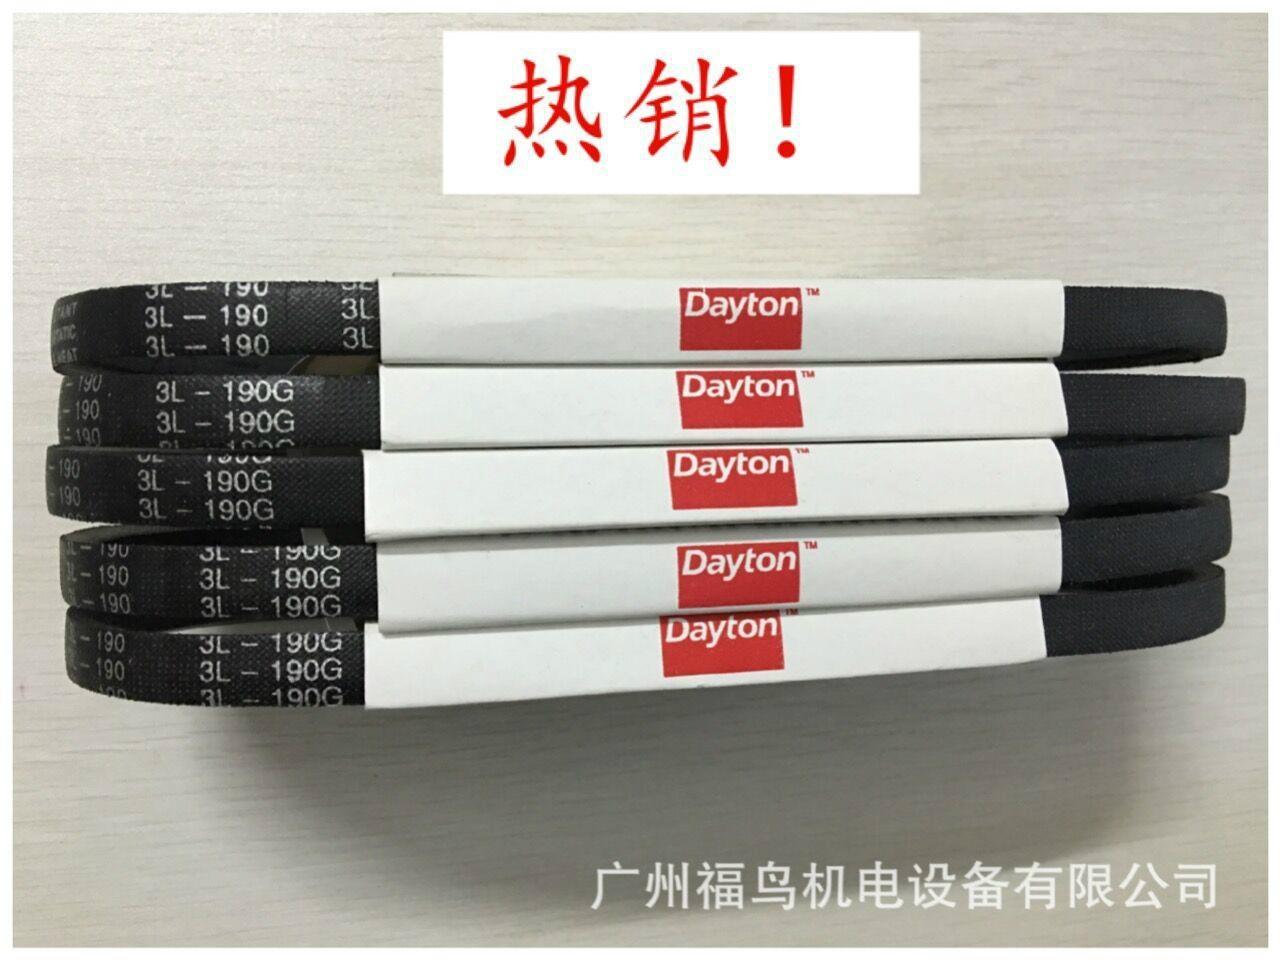 DAYTON皮帶  型號: 3L190, 3L190G